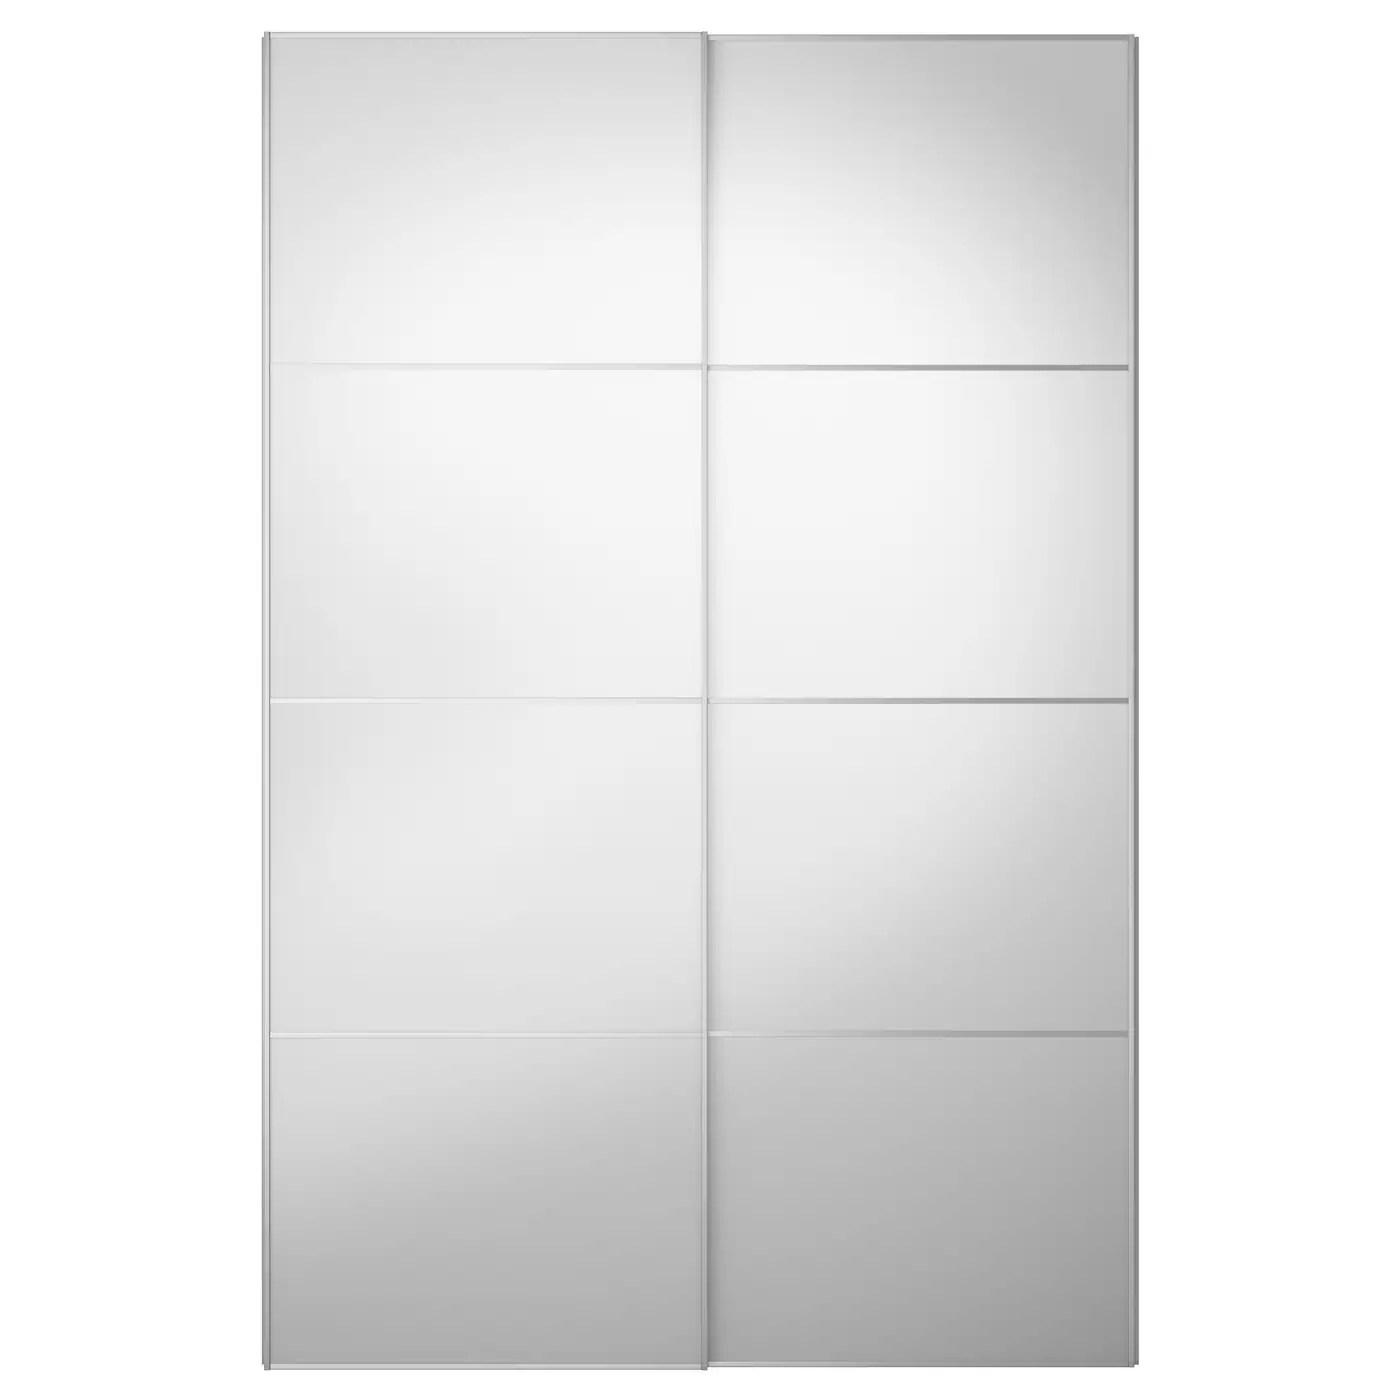 Auli Pair Of Sliding Doors Mirror Glass Ikea